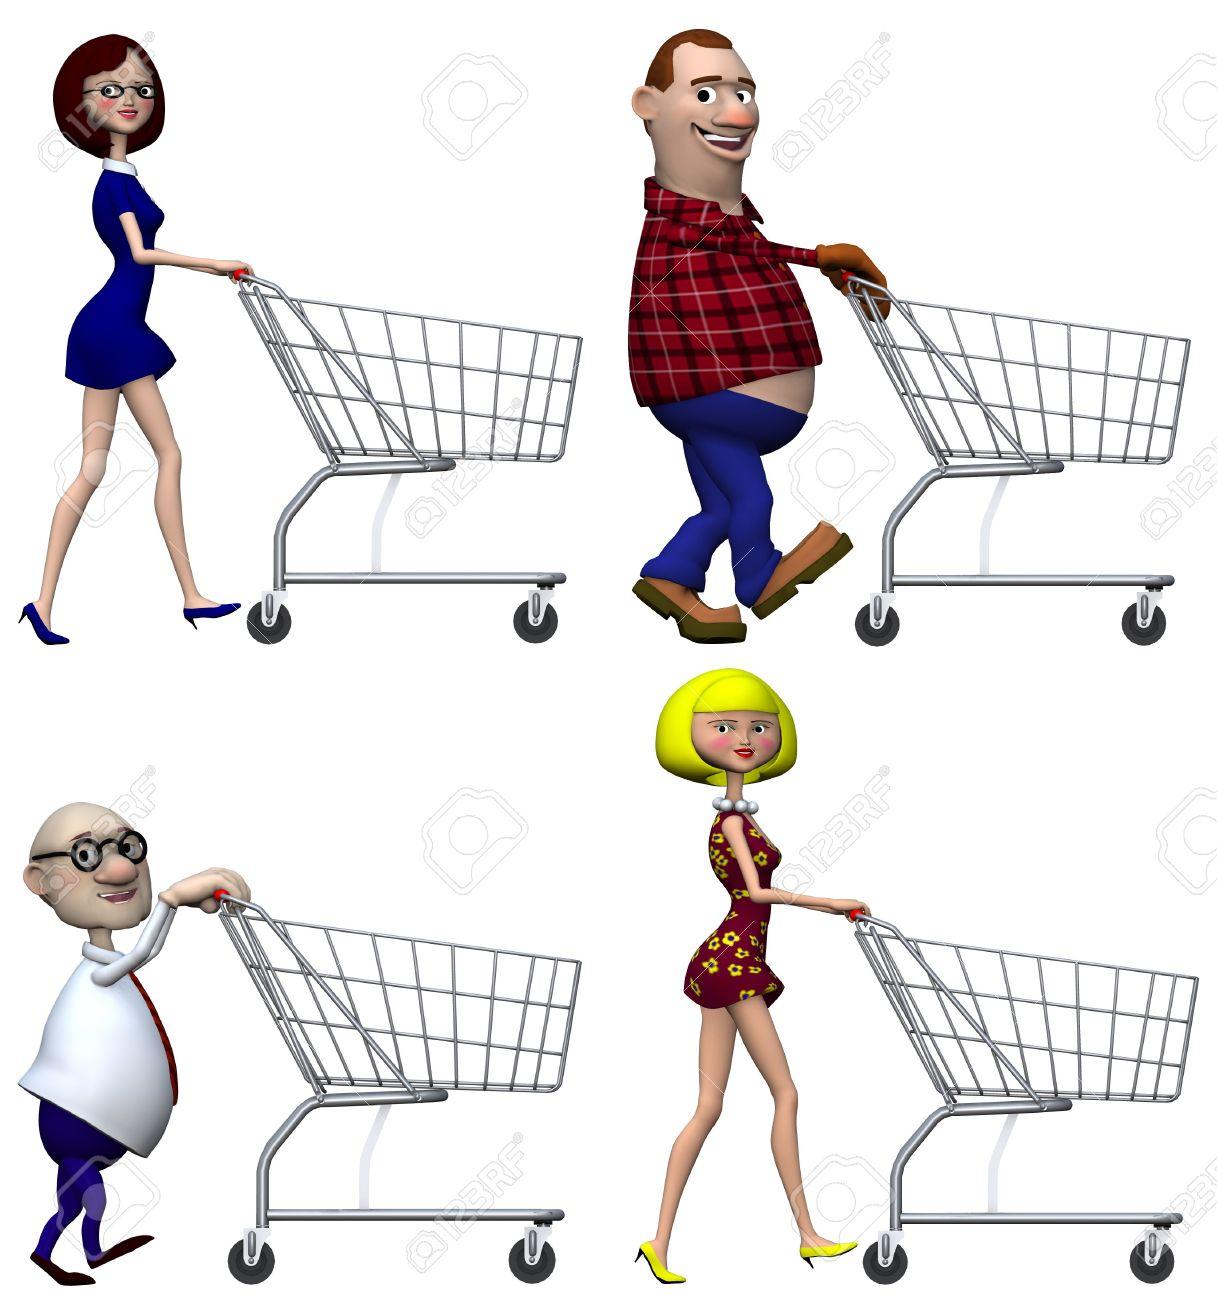 Happy smiling cartoon people Shoppers push Shopping Carts. Isolated on white. 3D illustration. Stock Illustration - 2438332